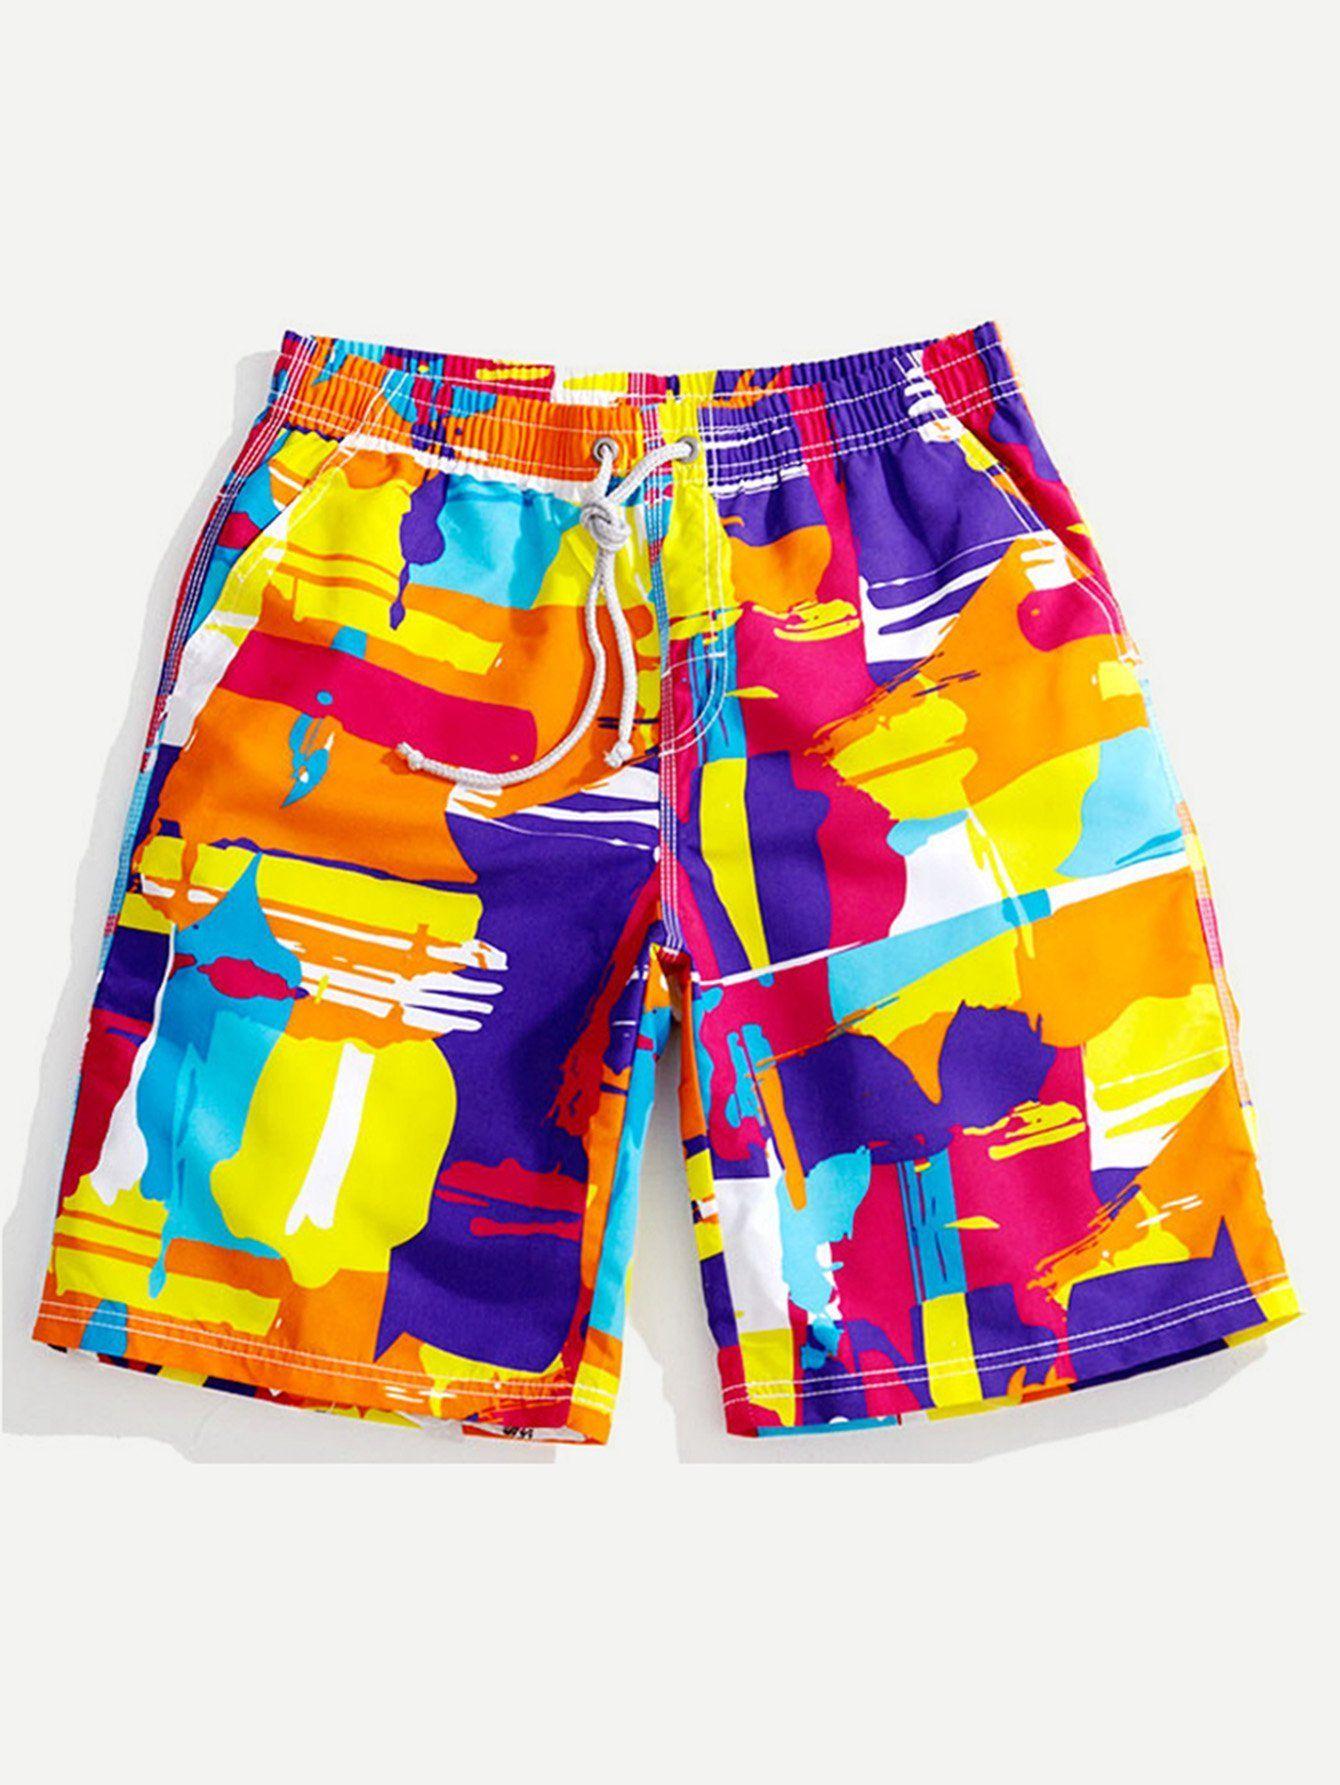 Tailor Pal Love Men Swim Trunks Short Pocket Adjustable Board Short with Linimg